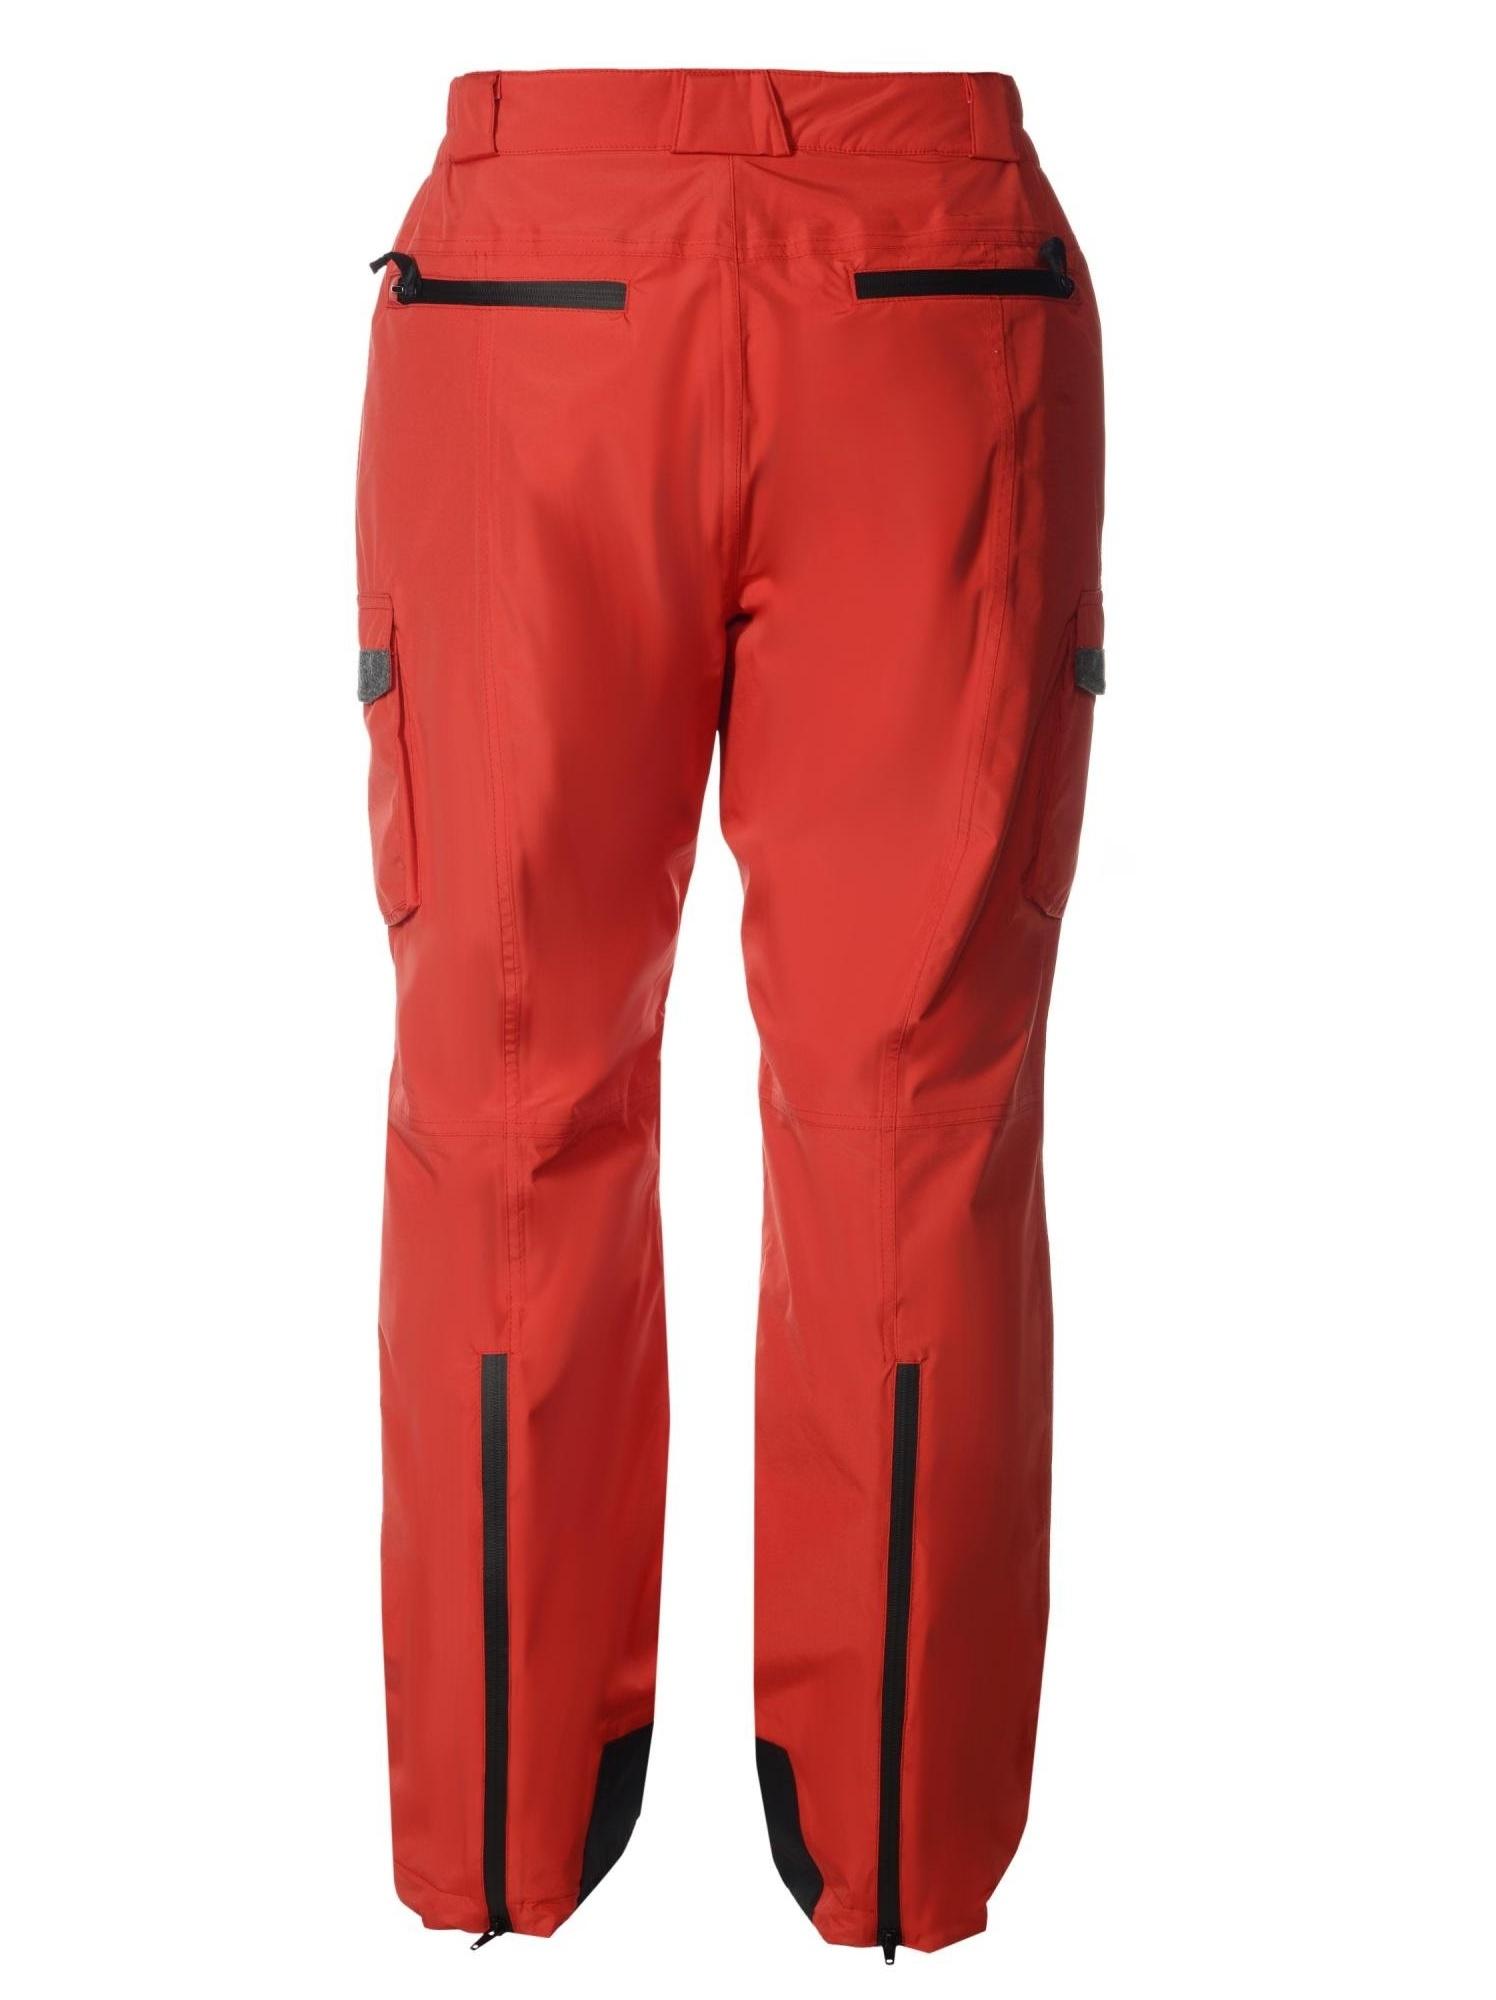 Мужская горнолыжныя одежда Almrausch Hochbruck 121326-2609 красные